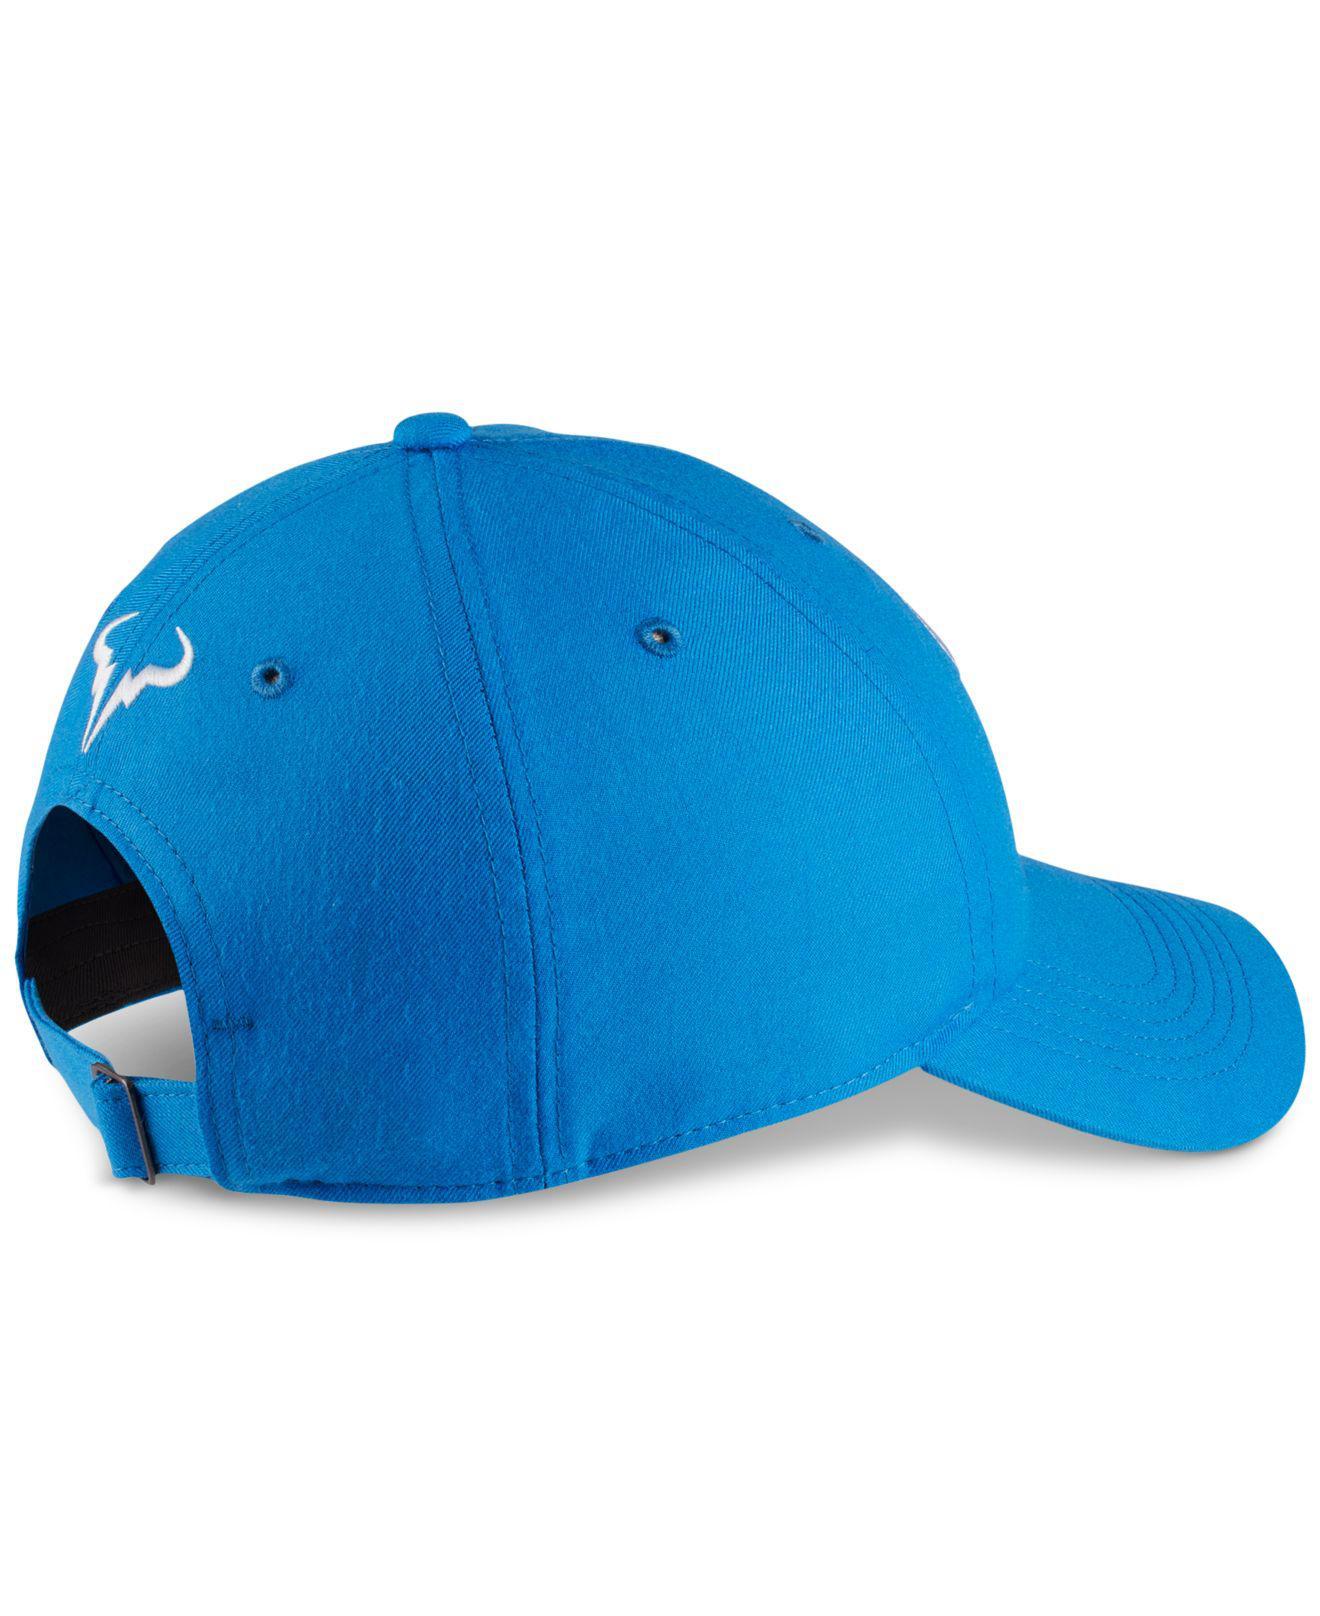 04ca57f401bf5 Nike Court Aerobill Rafa Tennis Hat in Blue for Men - Lyst